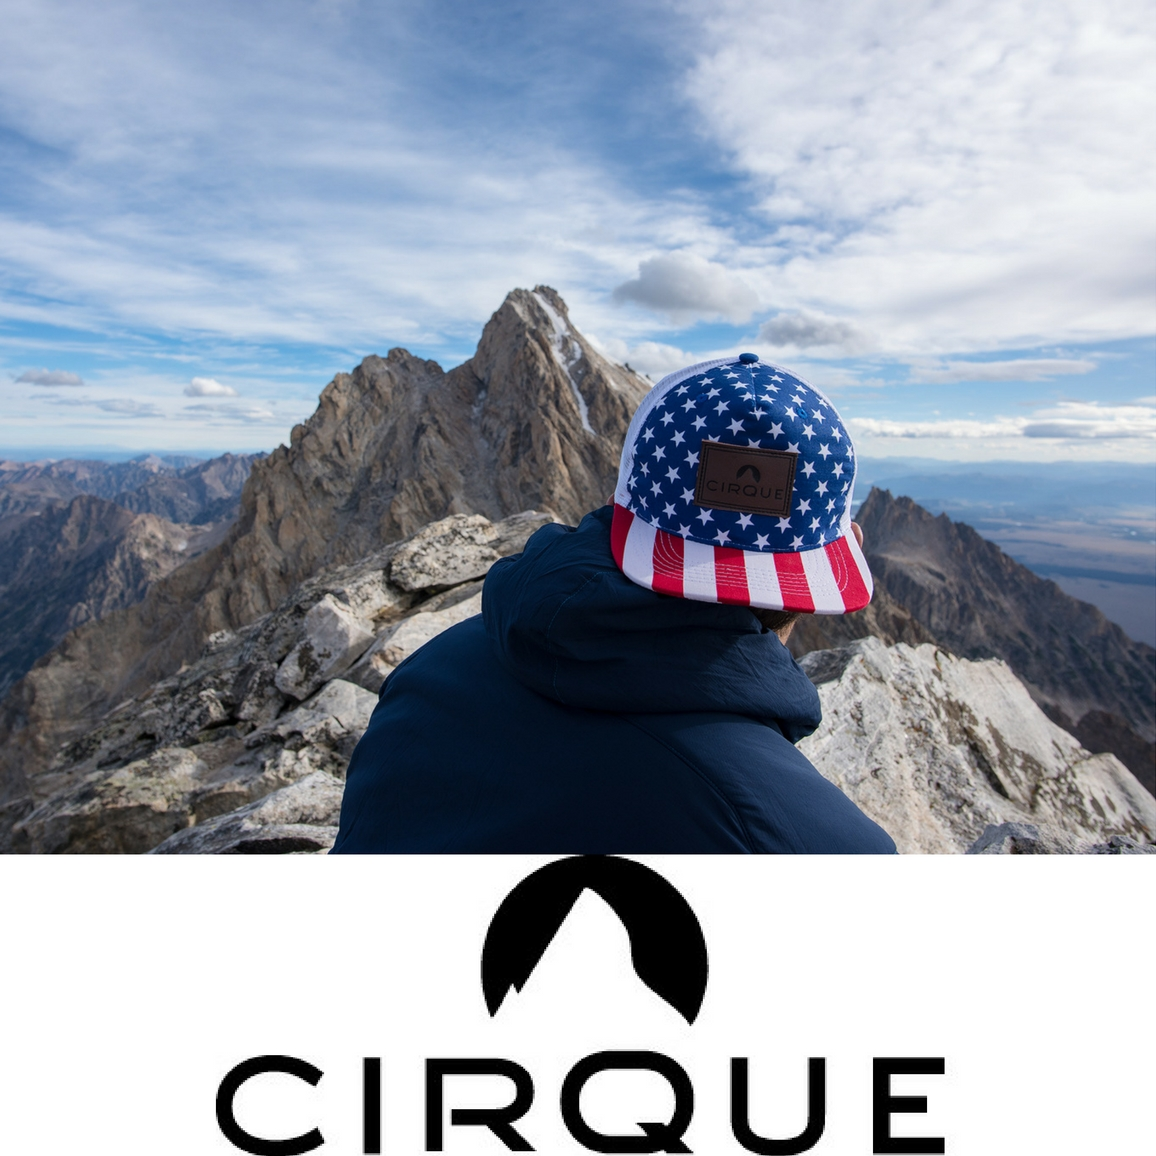 Cirque Mountain Apparel Brand Image.jpg